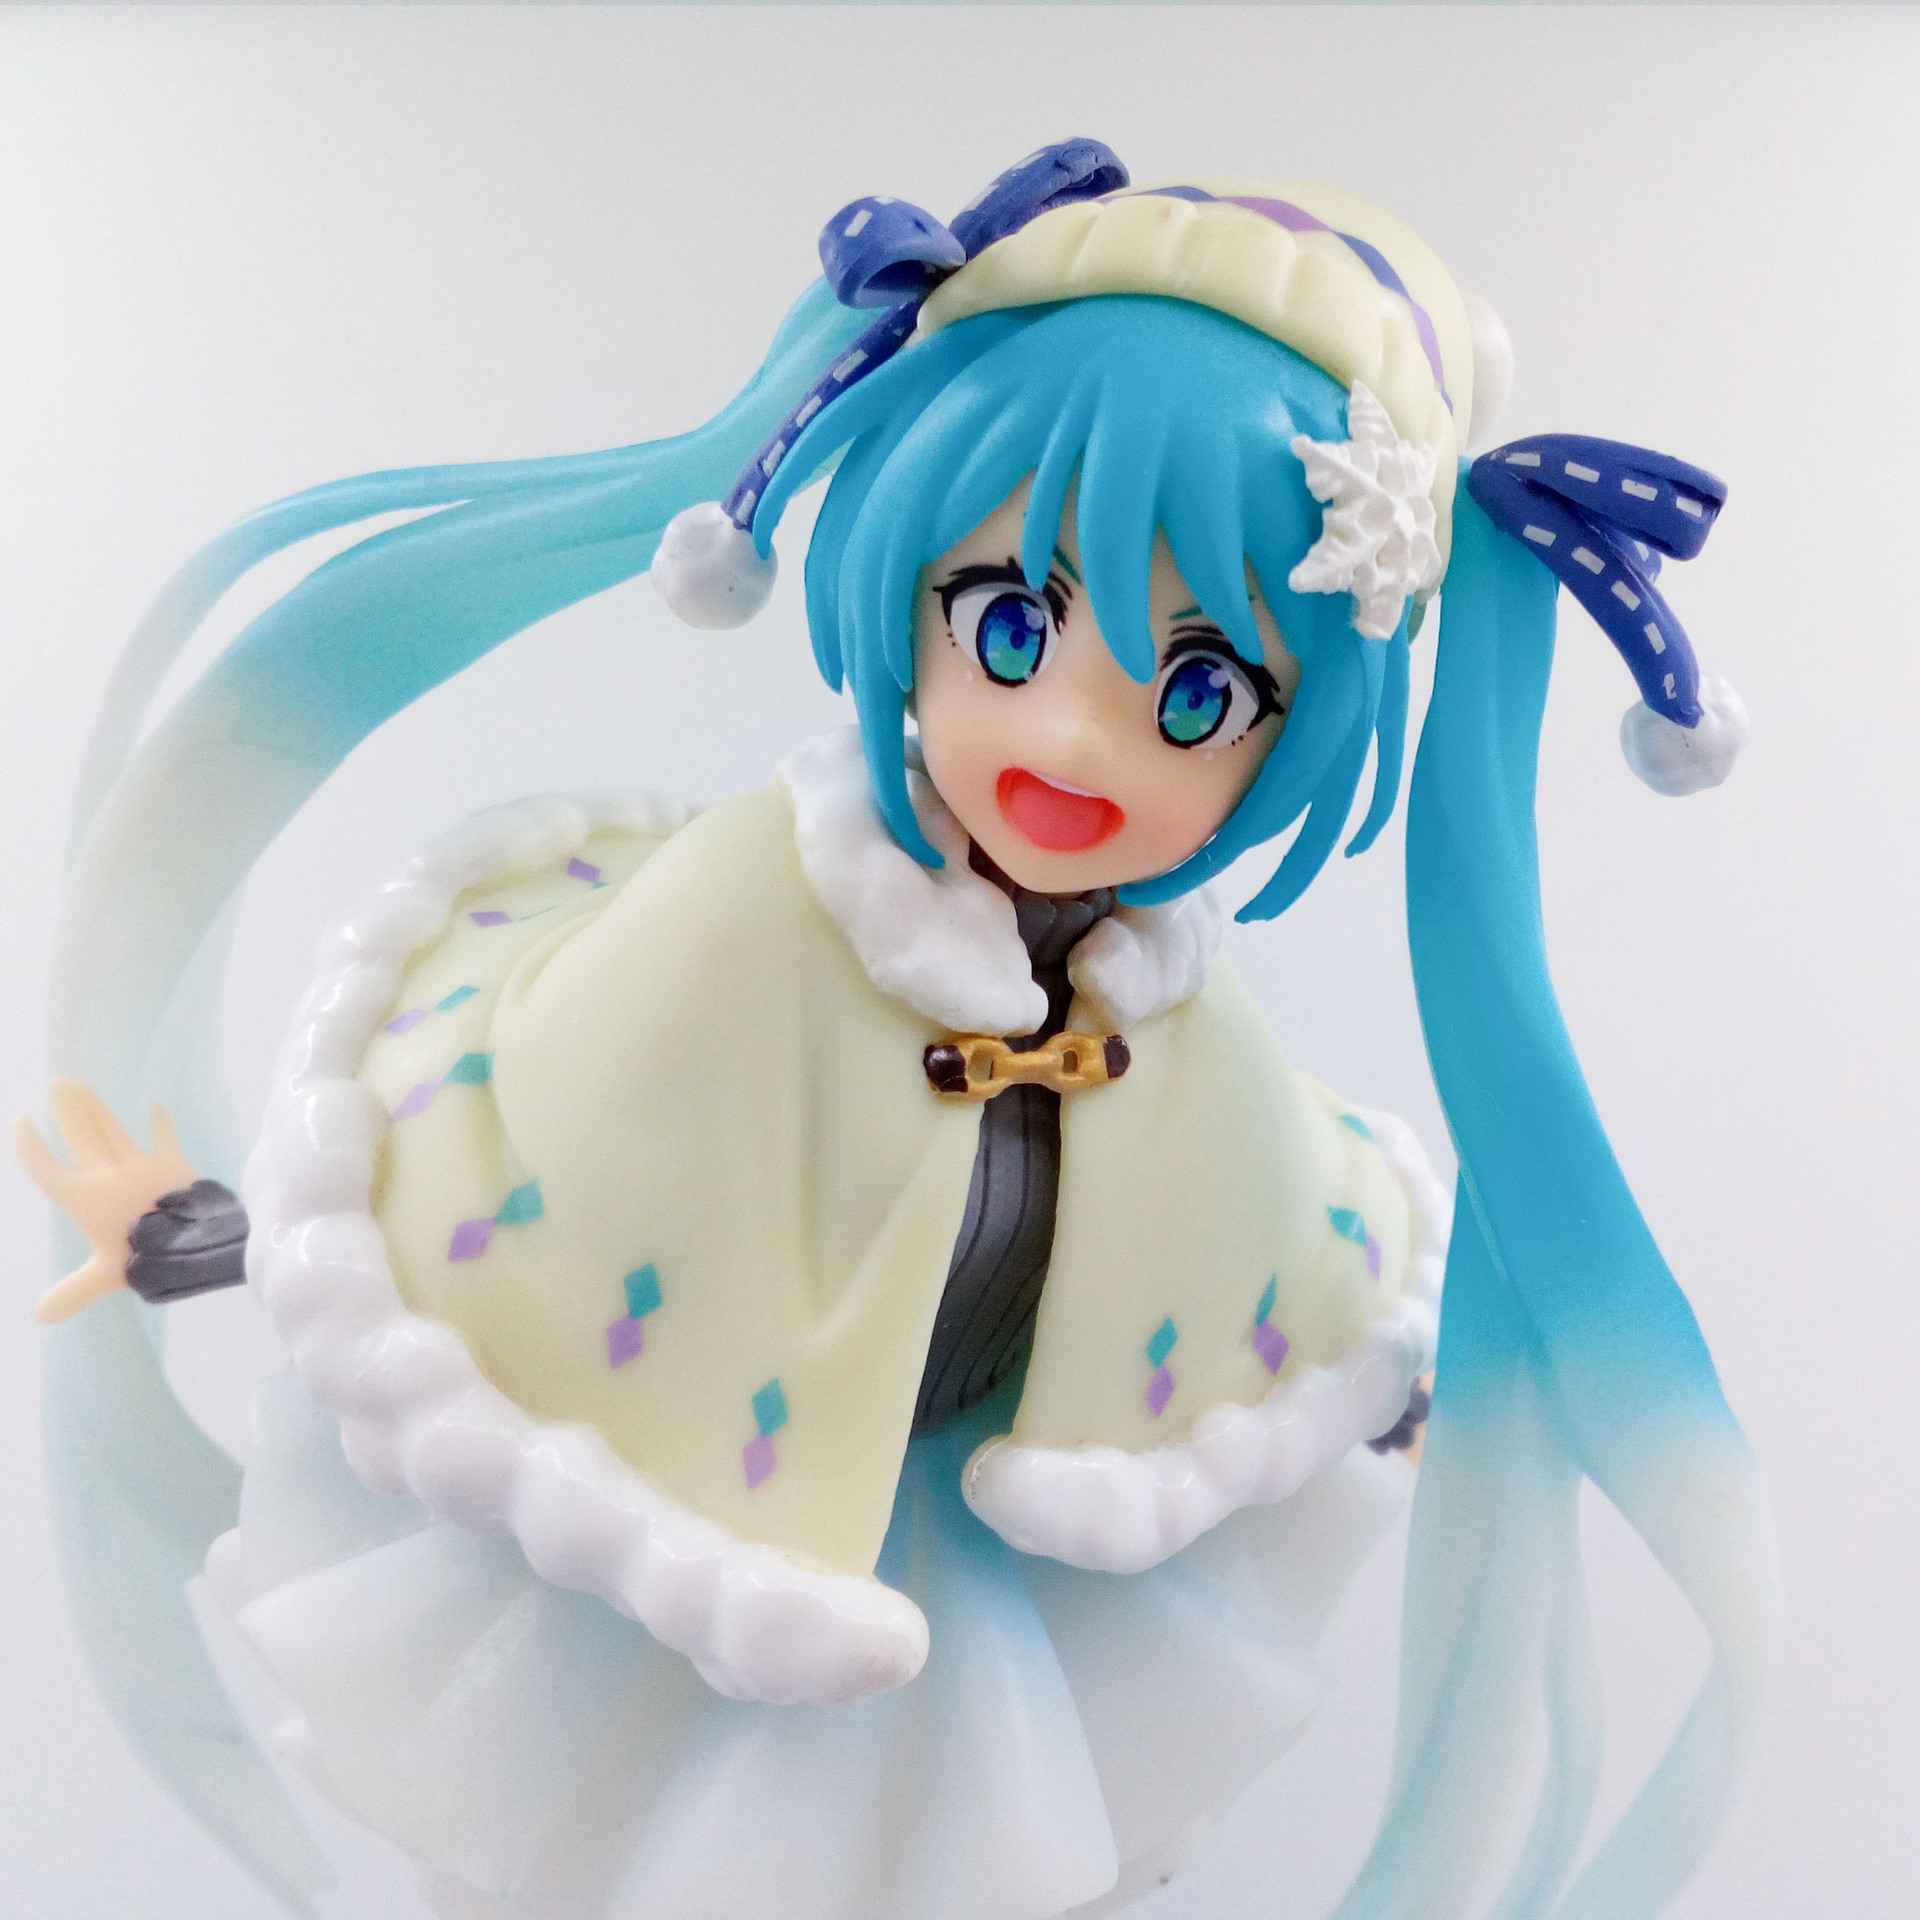 anime-font-b-vocaloid-b-font-hatsune-miku-snow-miku-winter-clothes-ver-pvc-action-figure-model-white-dress-children-collectible-doll-lelakaya